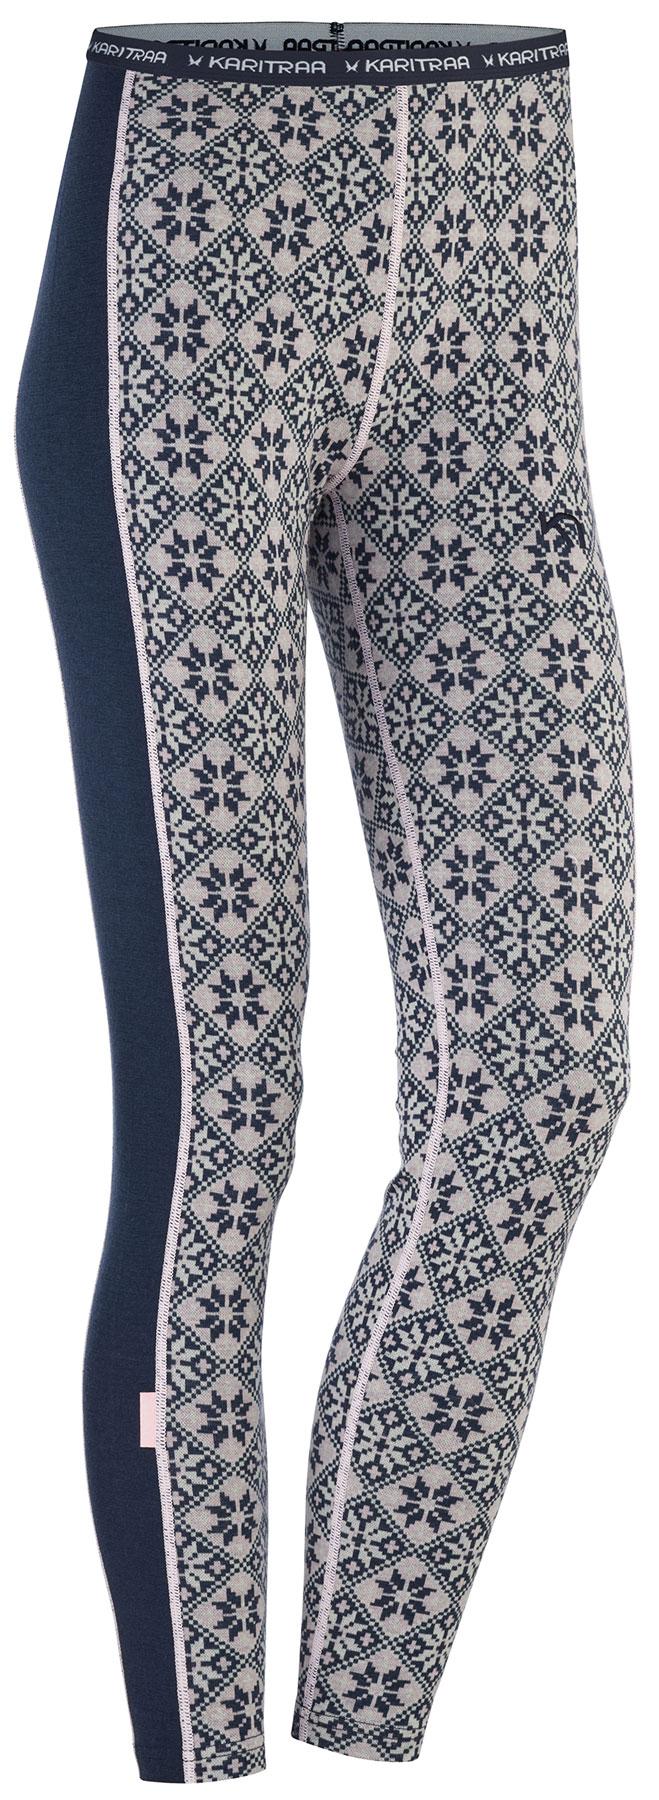 Kari Traa Rose Pant Women's Underpants - marin